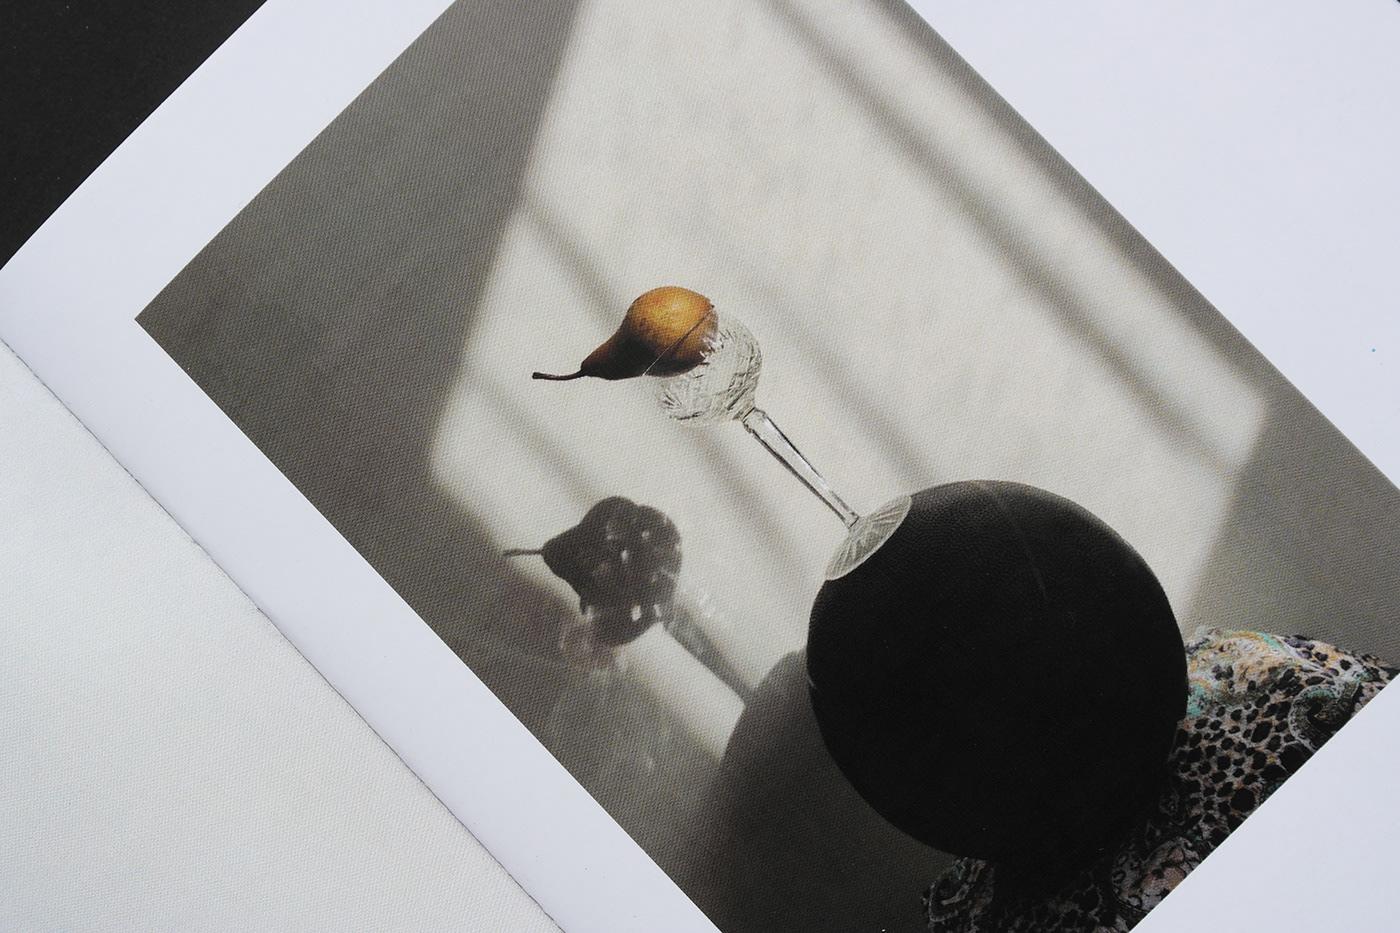 balance editorial experimental photo Photography  still life Zine